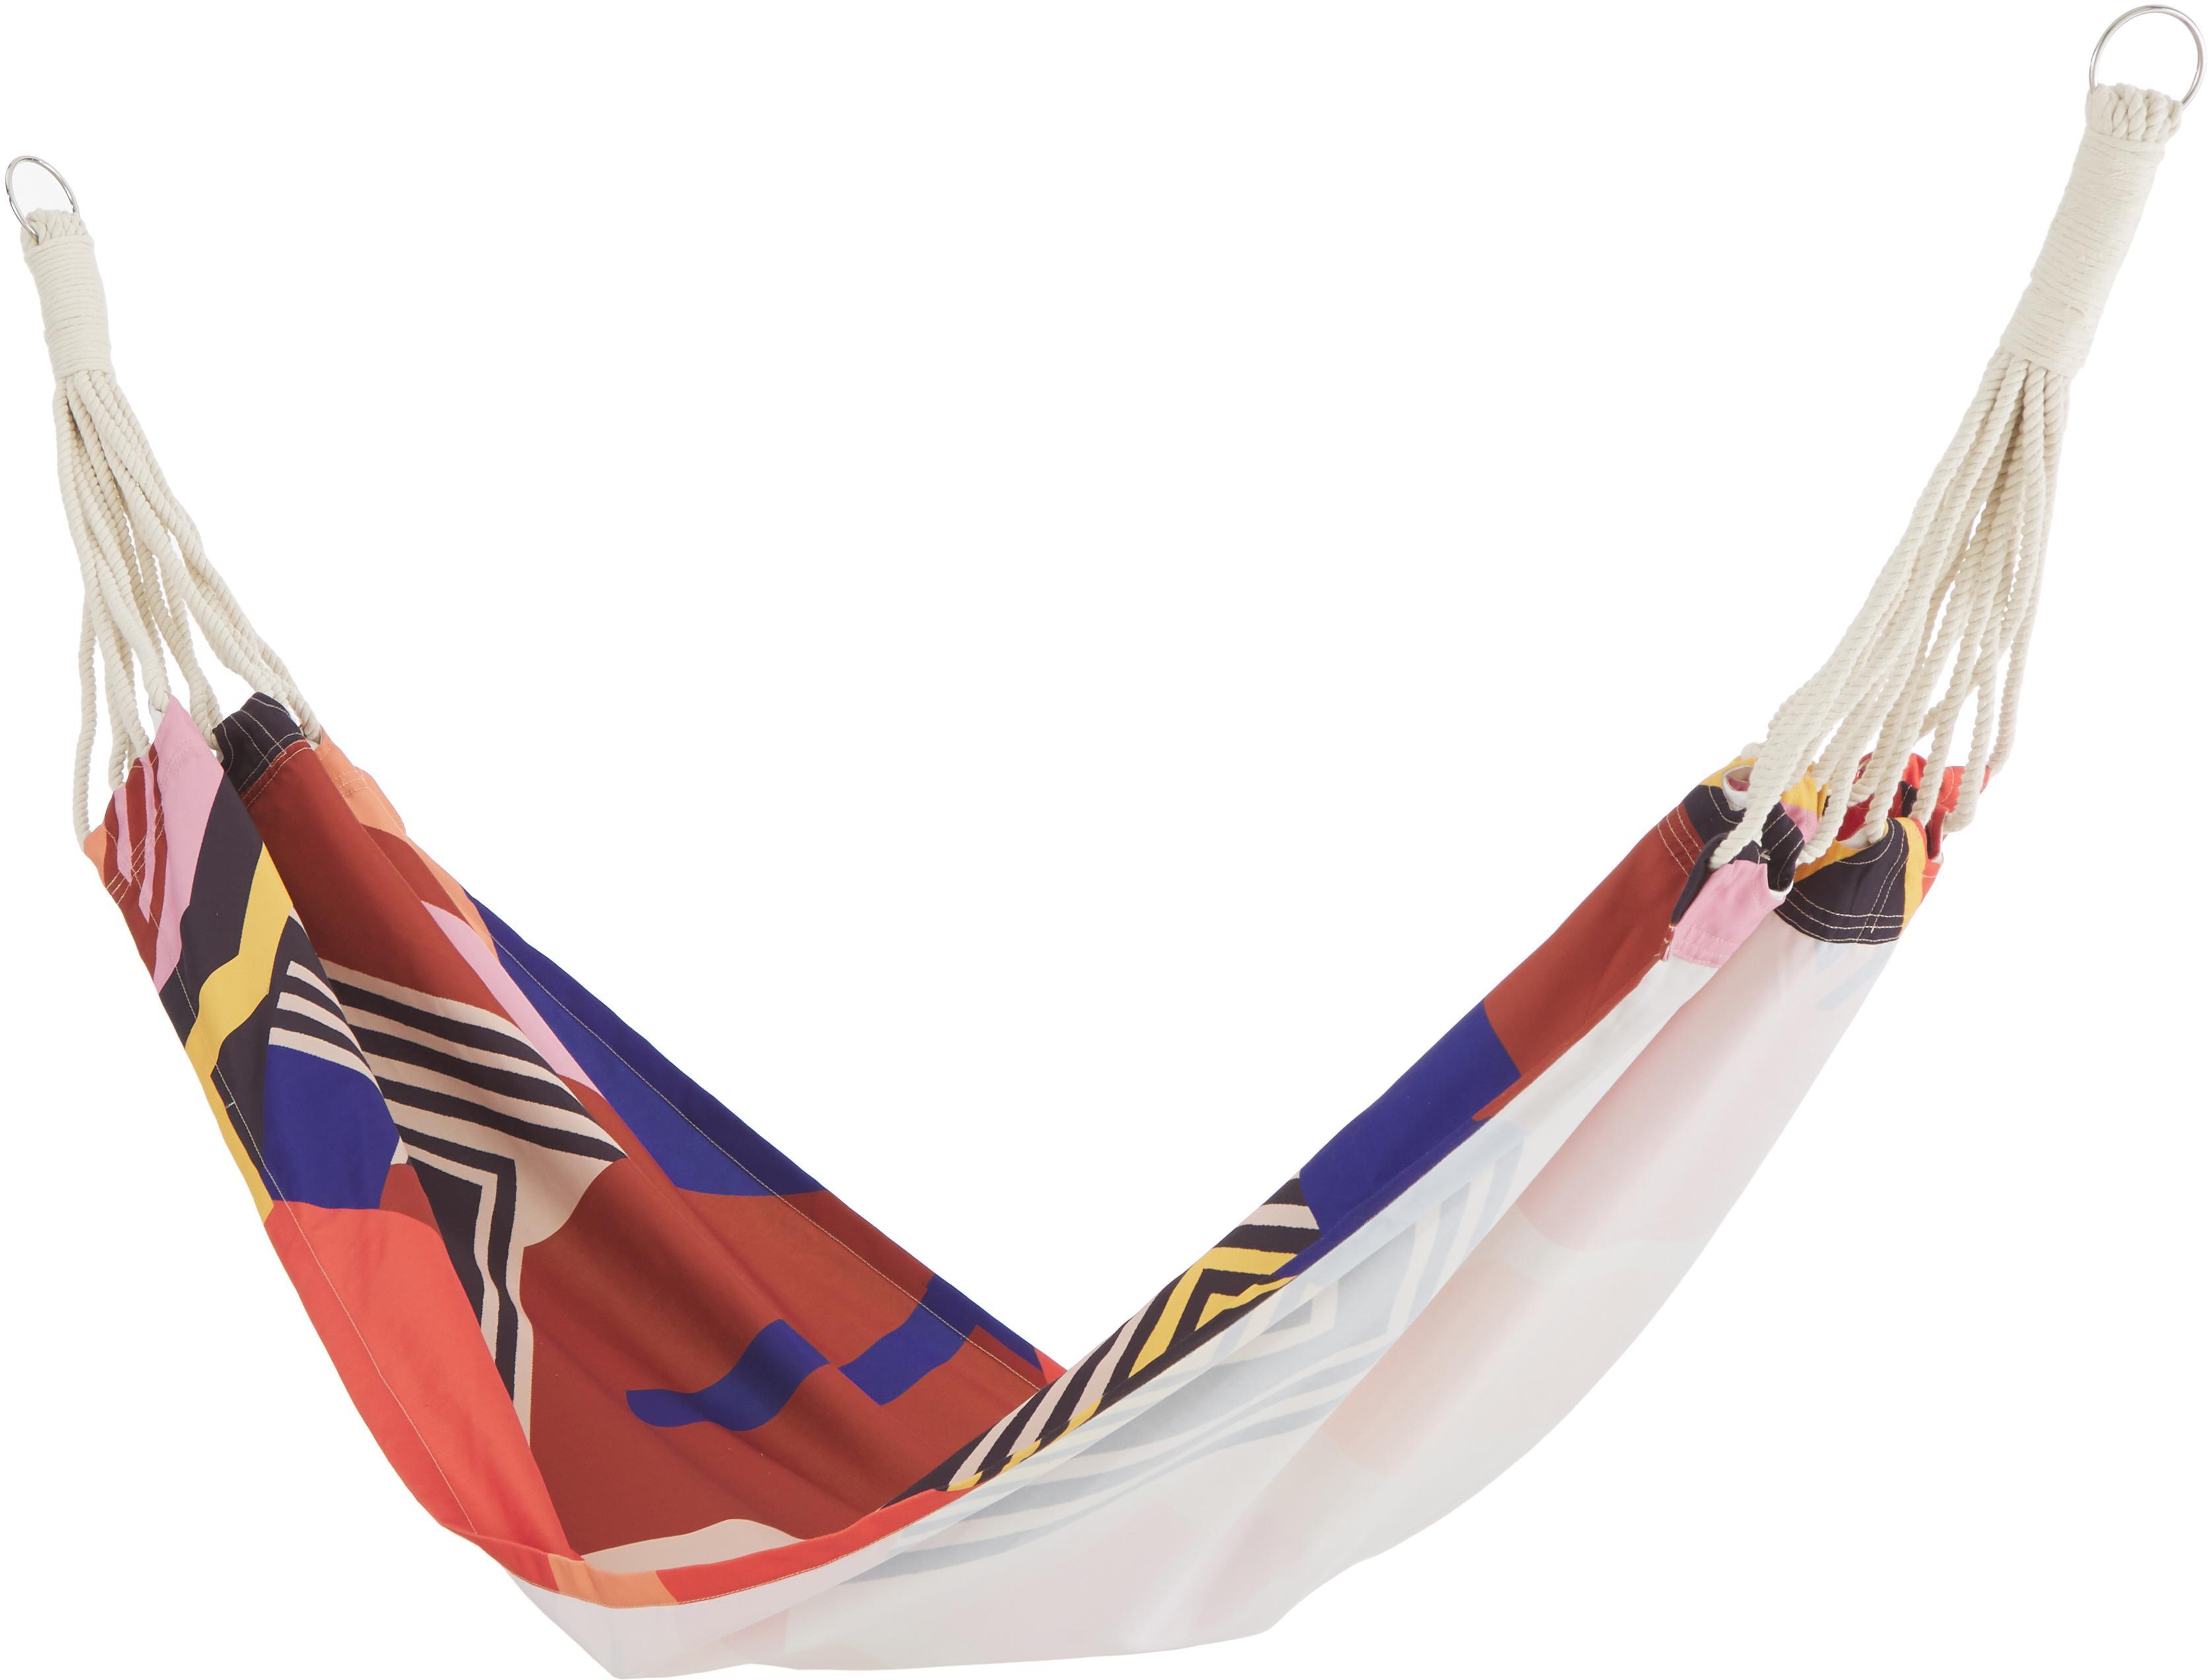 Hangmat Arti, Polyester, Rood, blauw, zwart, roze, geel, 80 x 180 cm